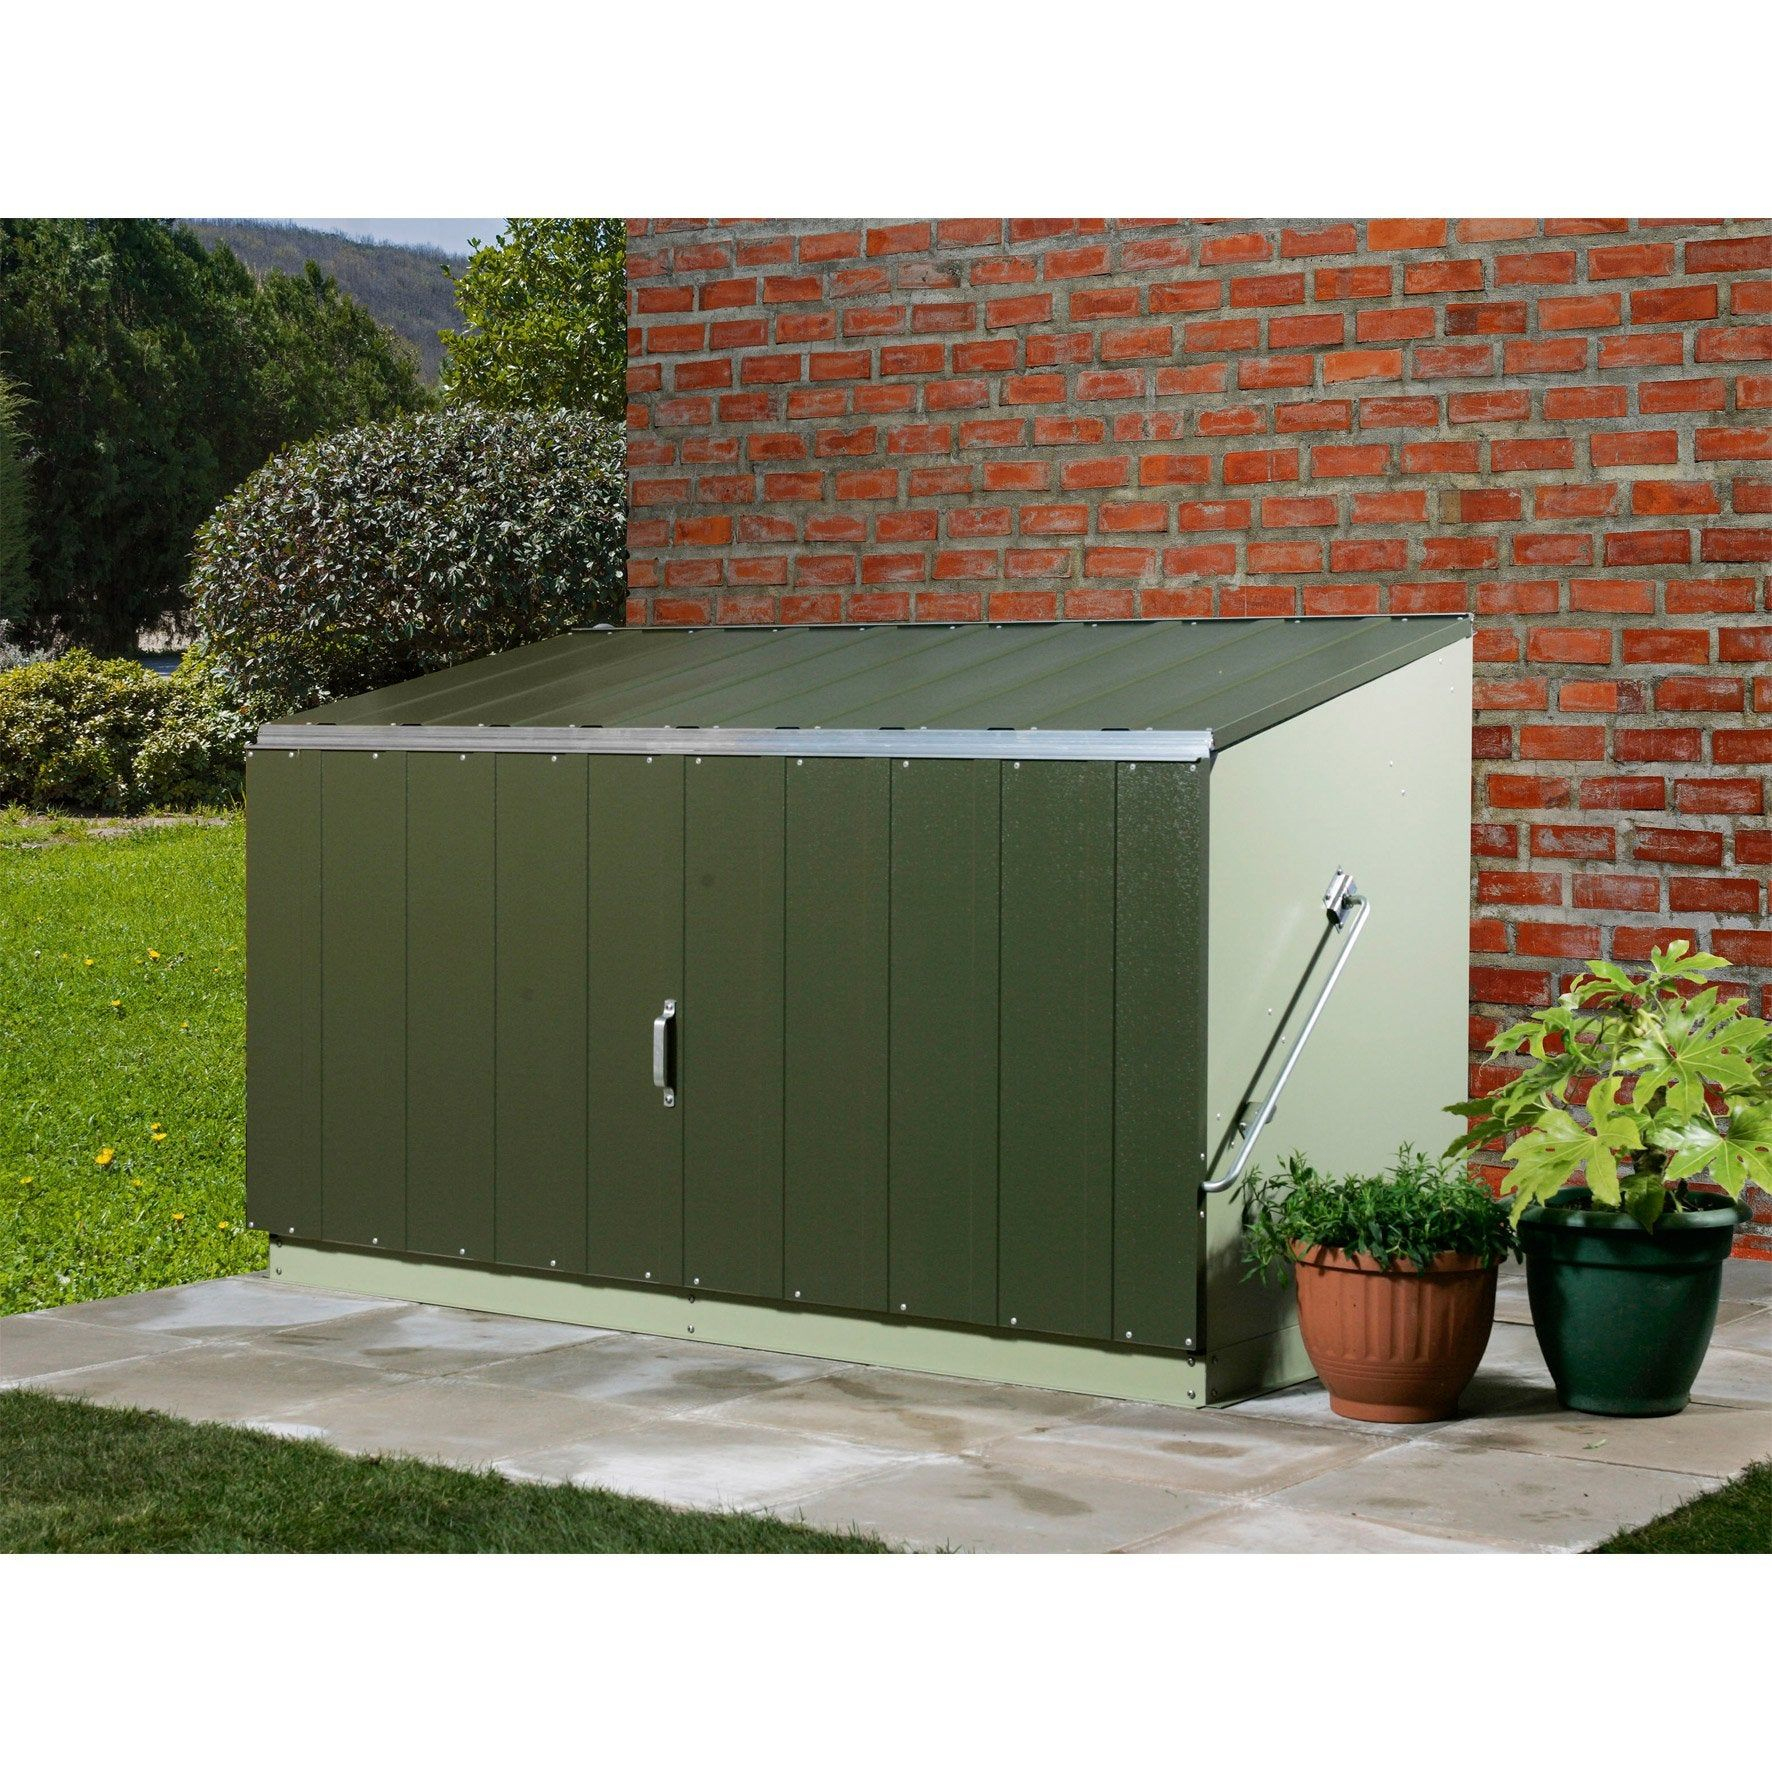 Coffre De Jardin Métal Storeguard, Vert Pâle Et Olive, L.196 ... tout Coffre De Jardin Leroy Merlin